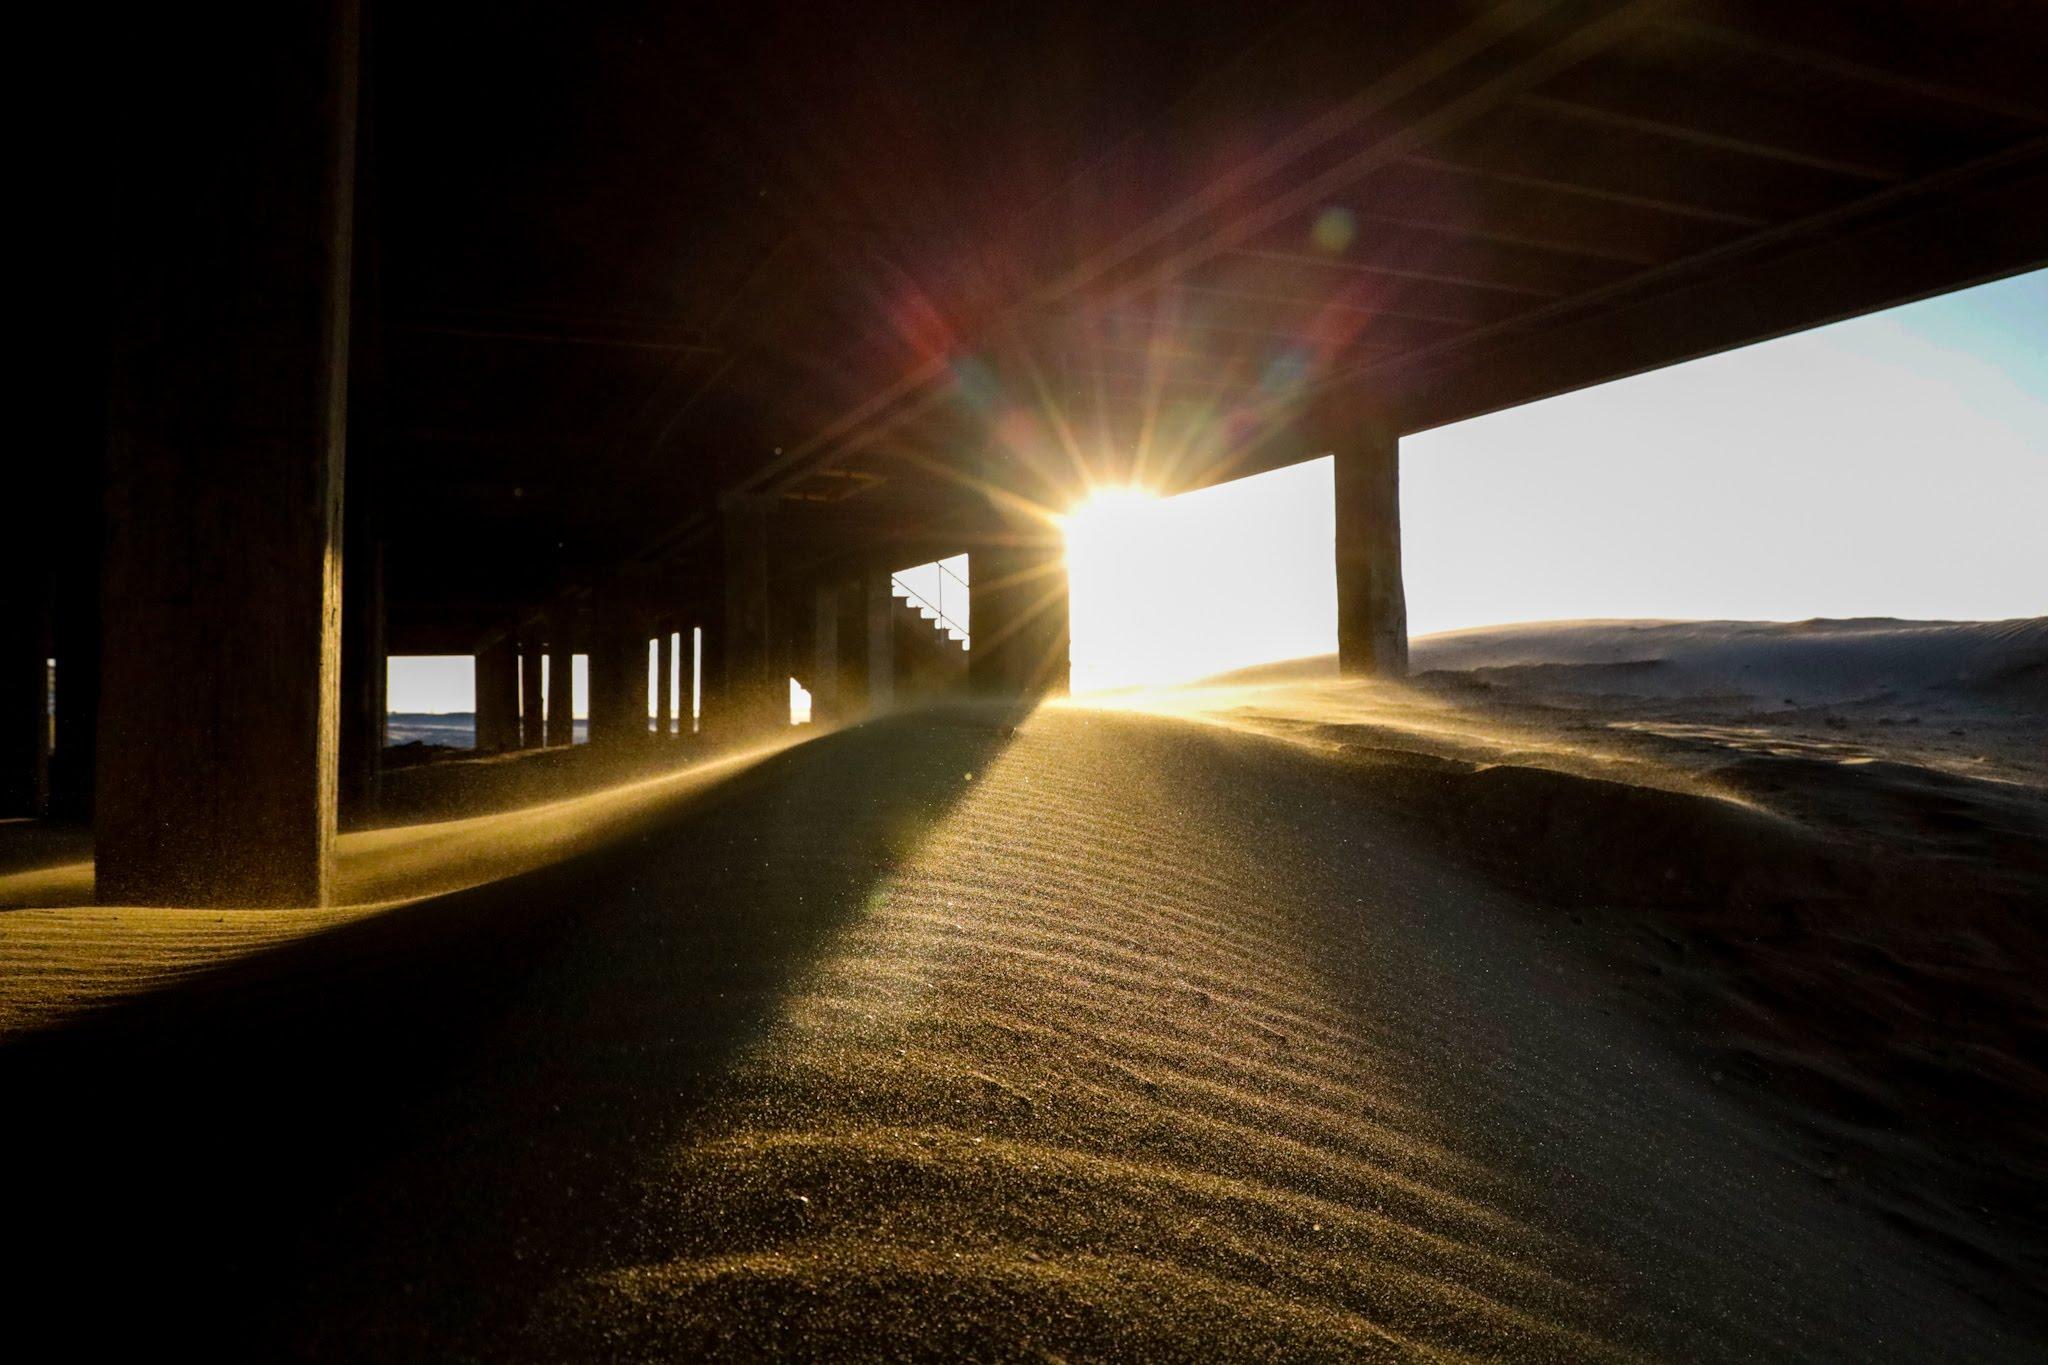 Vlieland - Sustainable Travel - The Netherlands